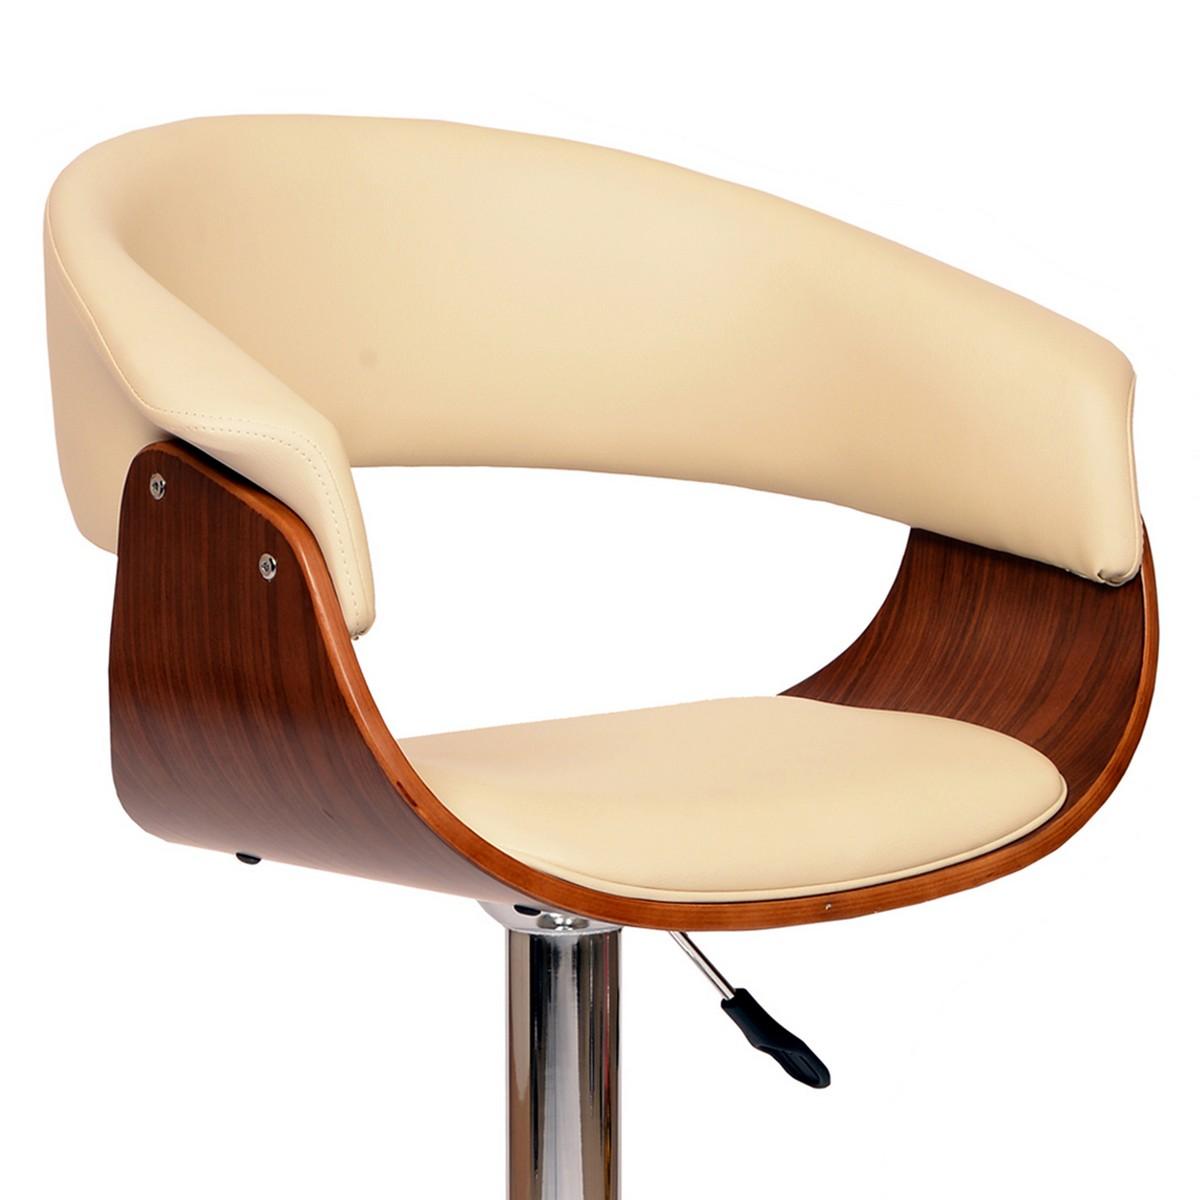 Armen Living Paris Swivel Barstool In Cream Leatherette/ Walnut Veneer and Chrome Base